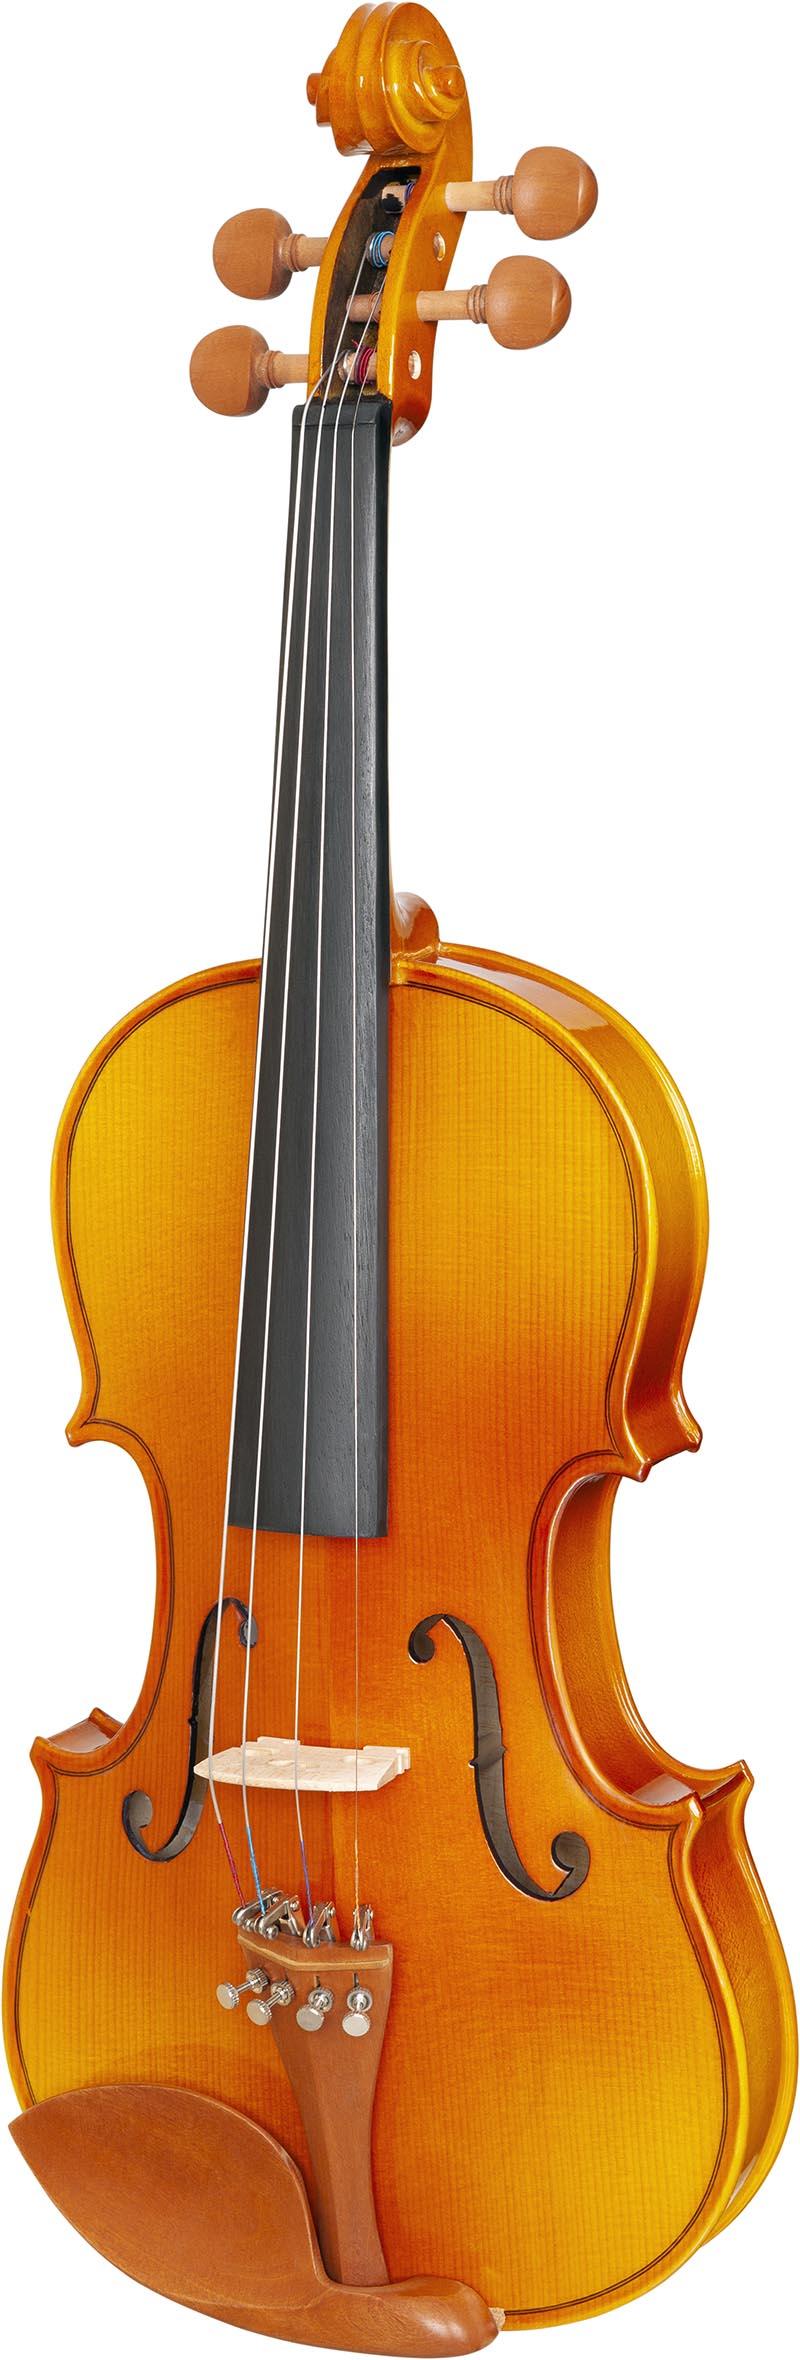 ve442 violino eagle ve442 visao frontal vertical